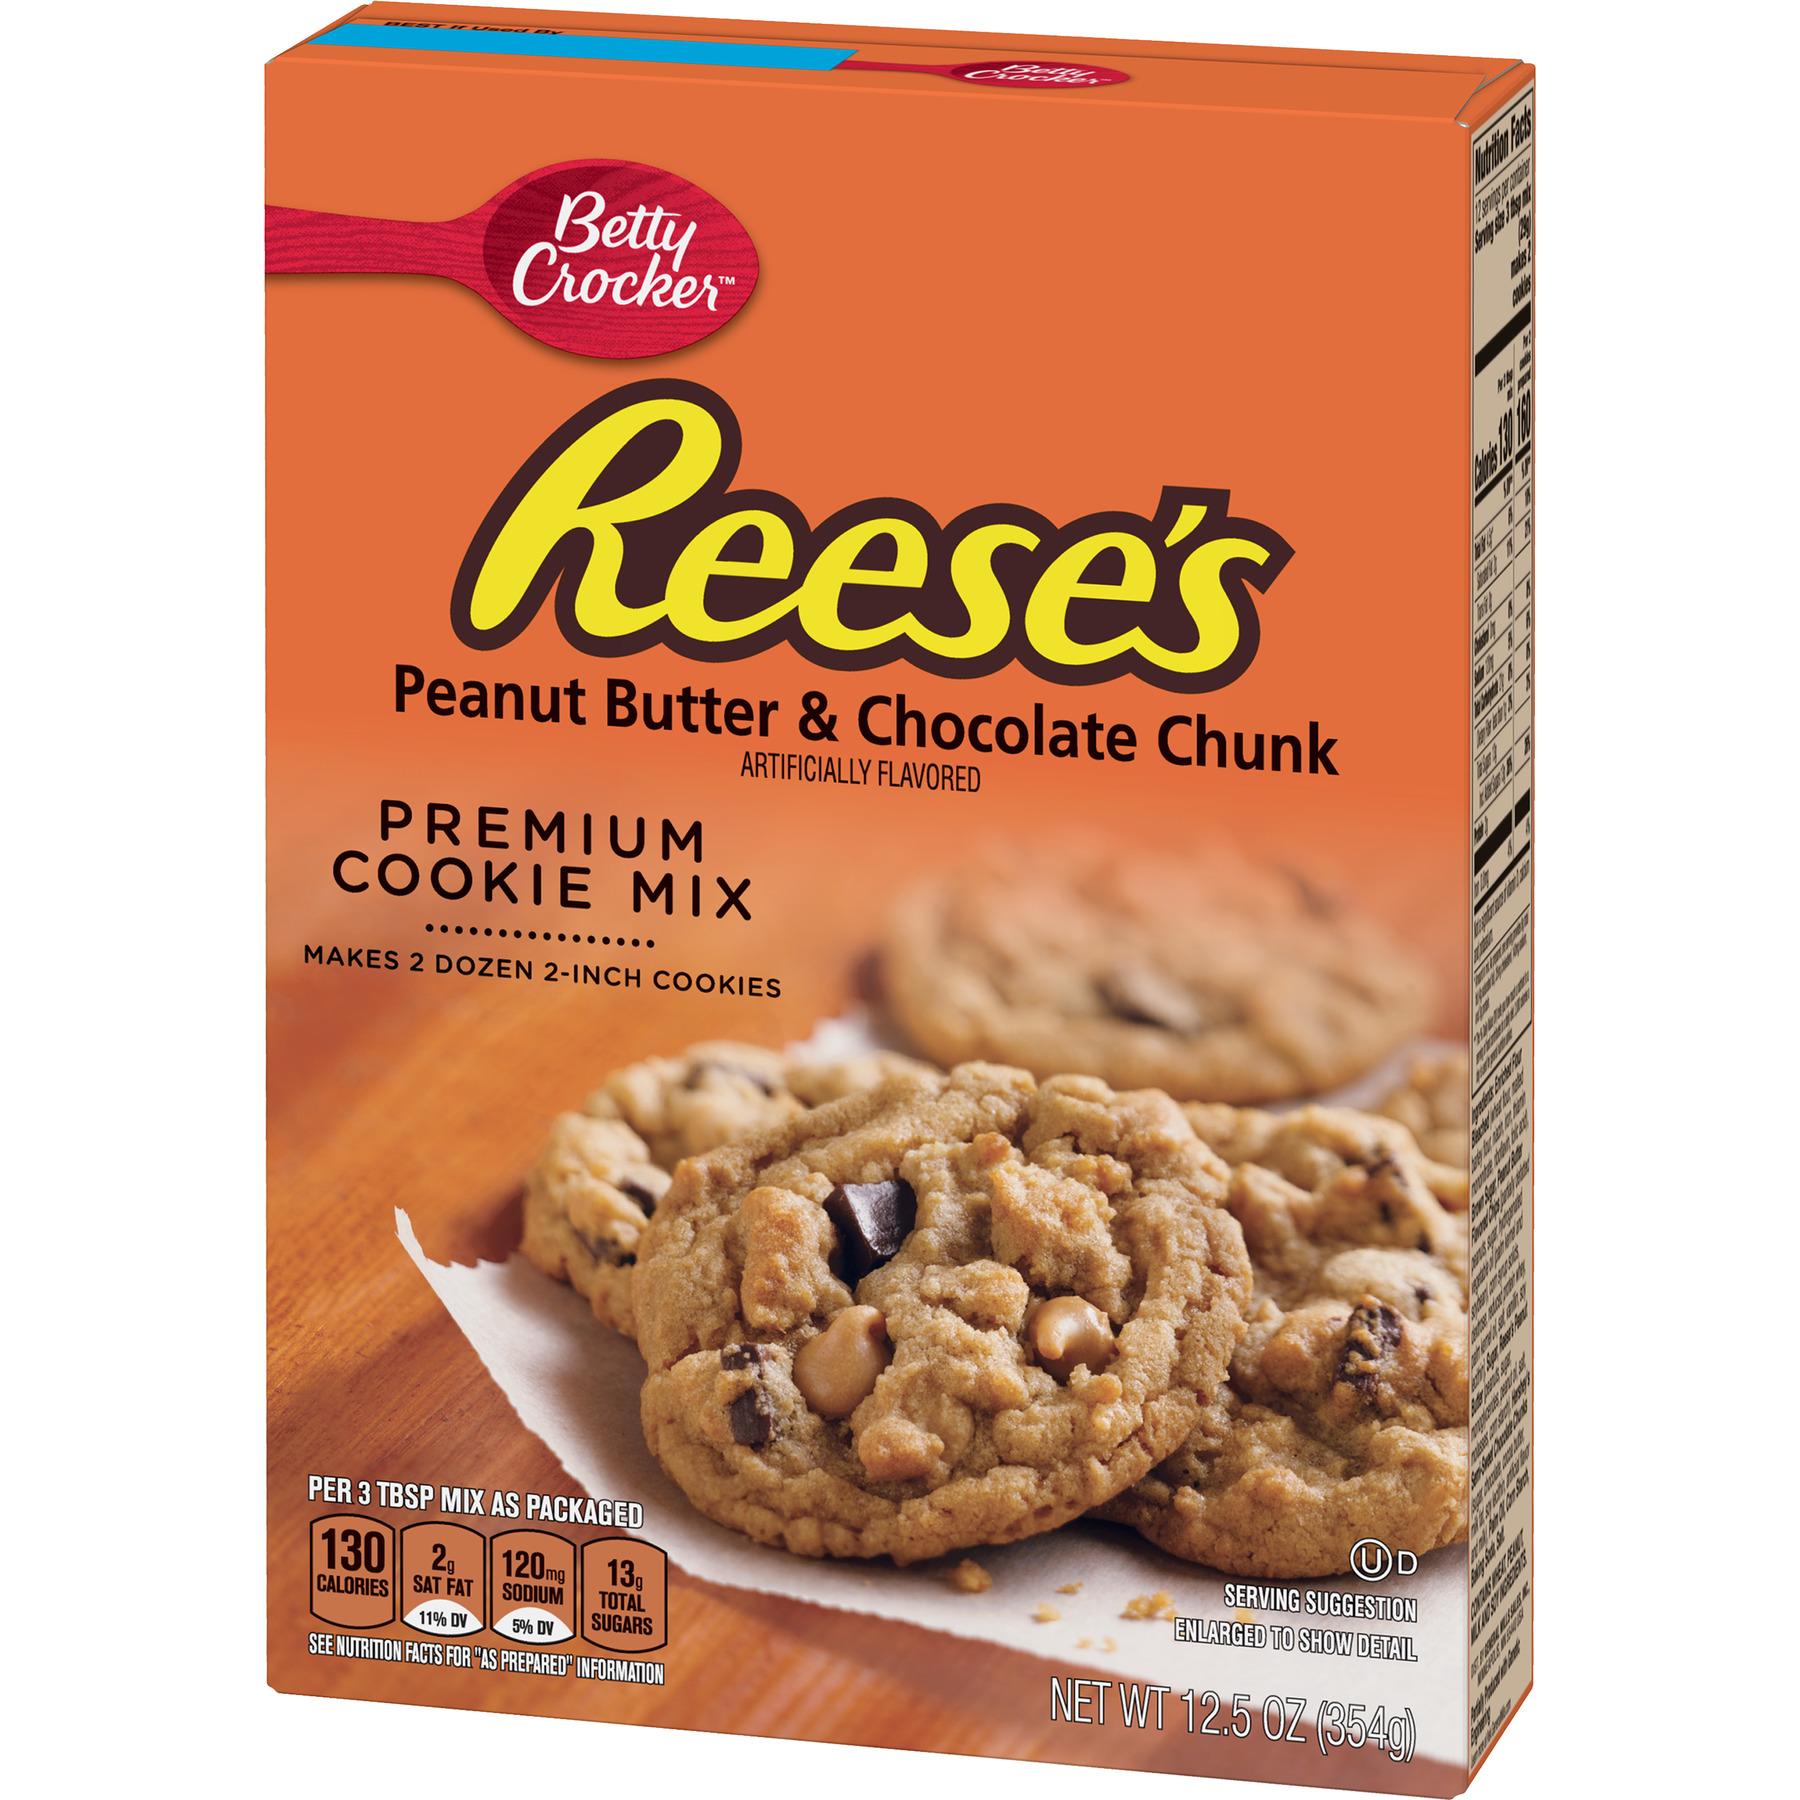 Betty Crocker Reese S Peanut Butter Choc Chunk Cookie Mix 12 5 Oz Walmart Com Walmart Com